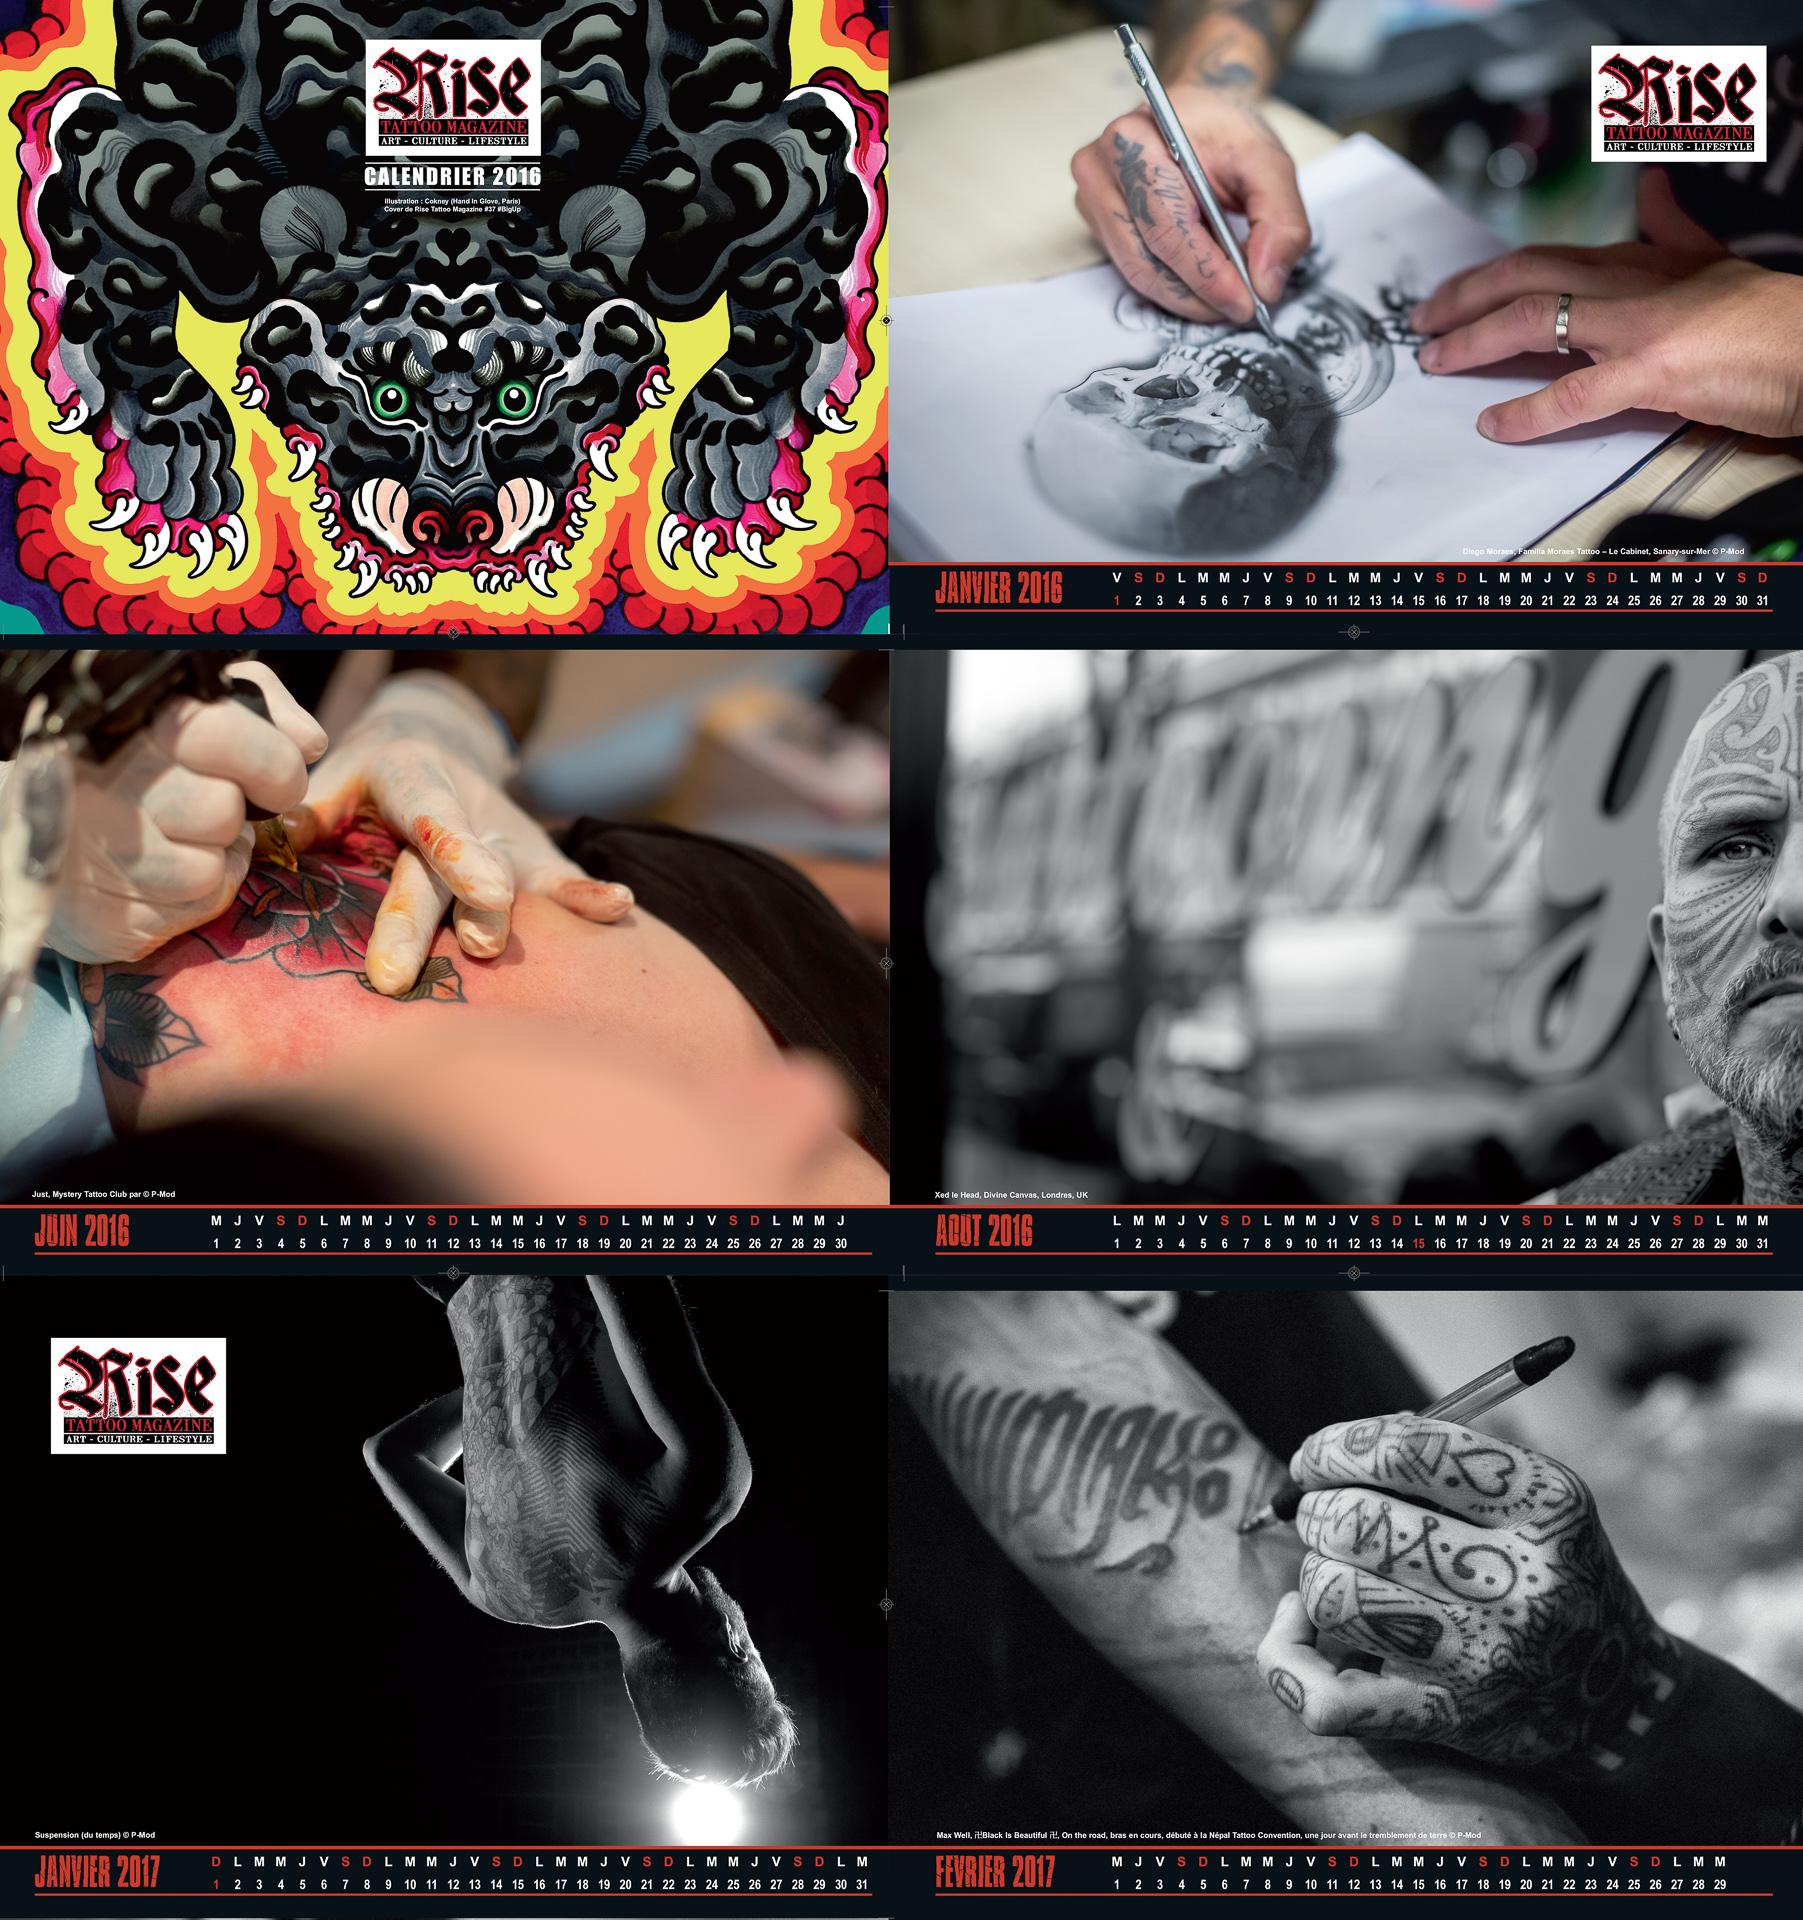 Rise tattoo Magazine #39 / Calendar 2016